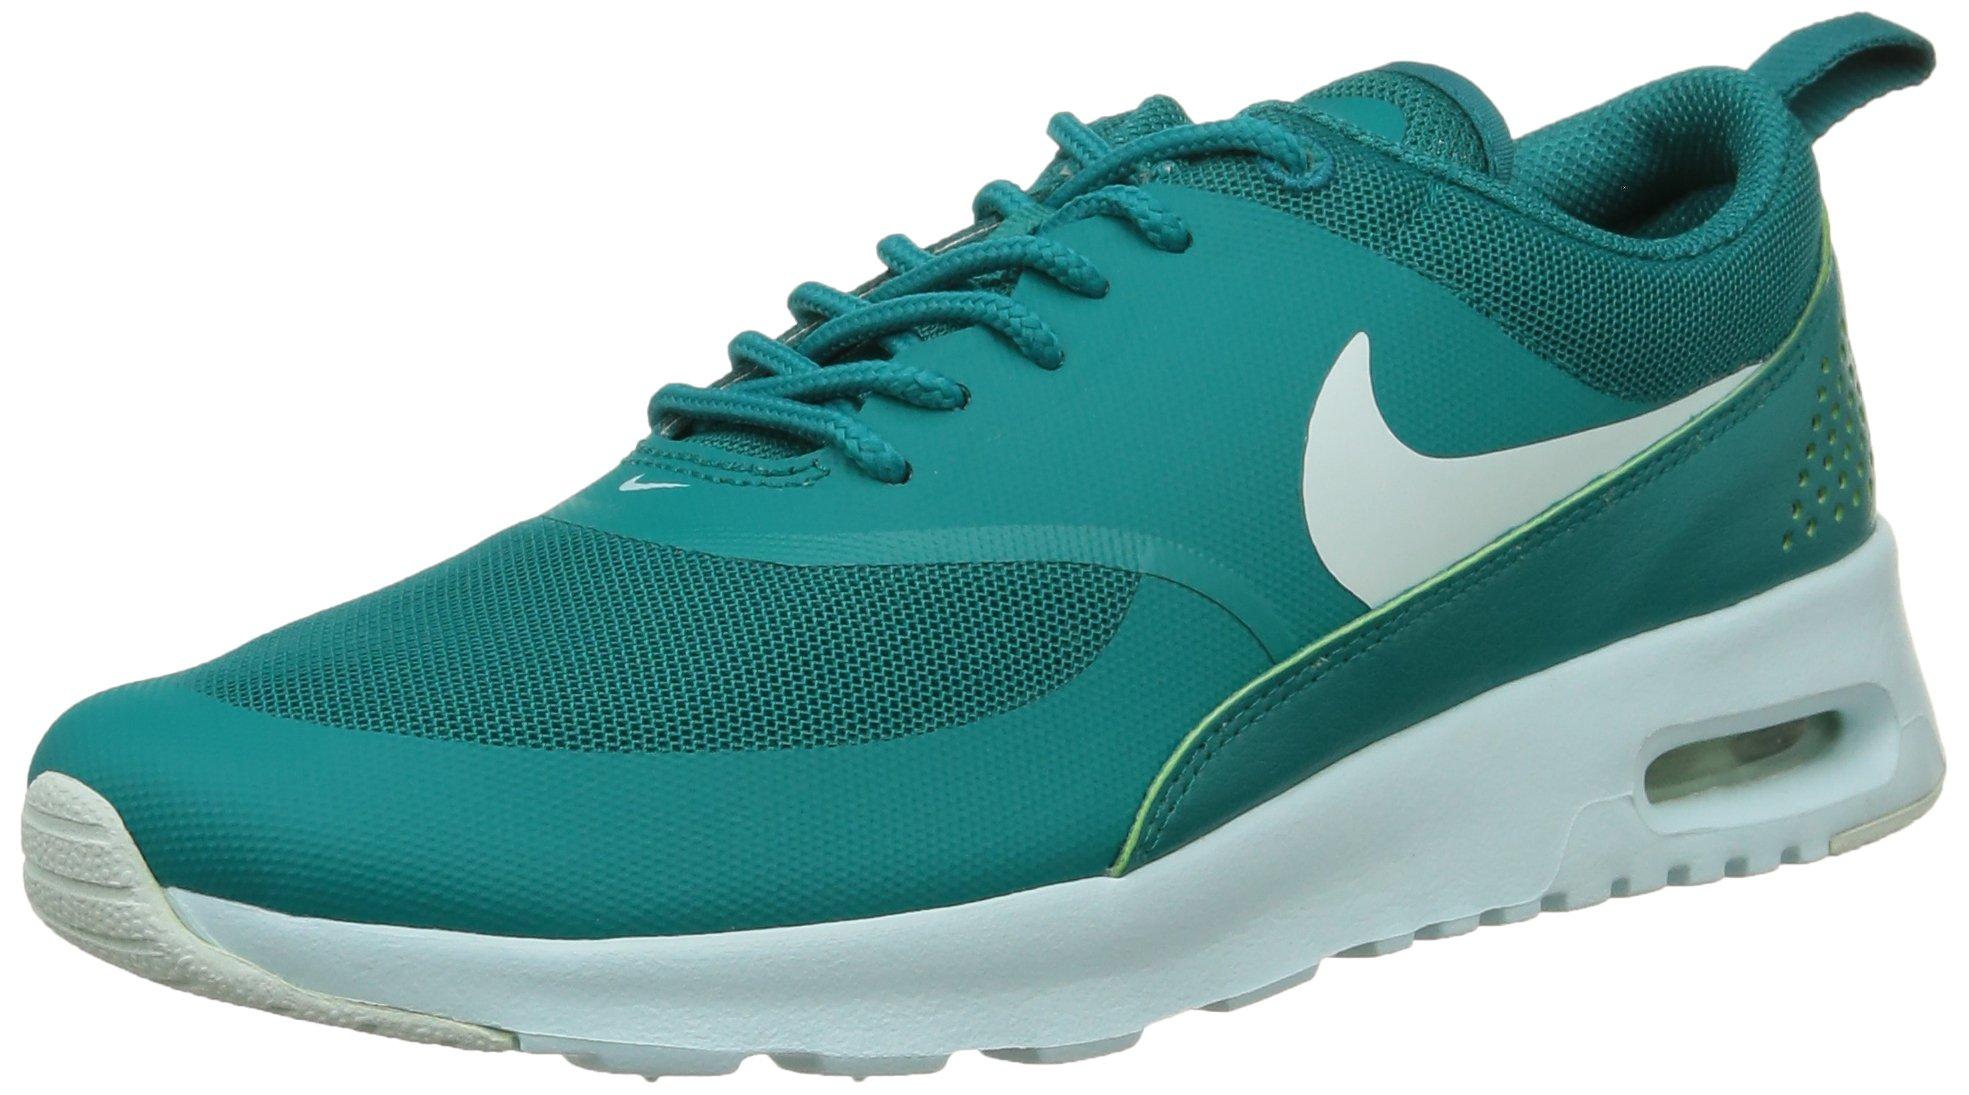 Nike Women's Air Max Thea Radiant Emerald/Fiberglass Running Shoe 6.5 Women US